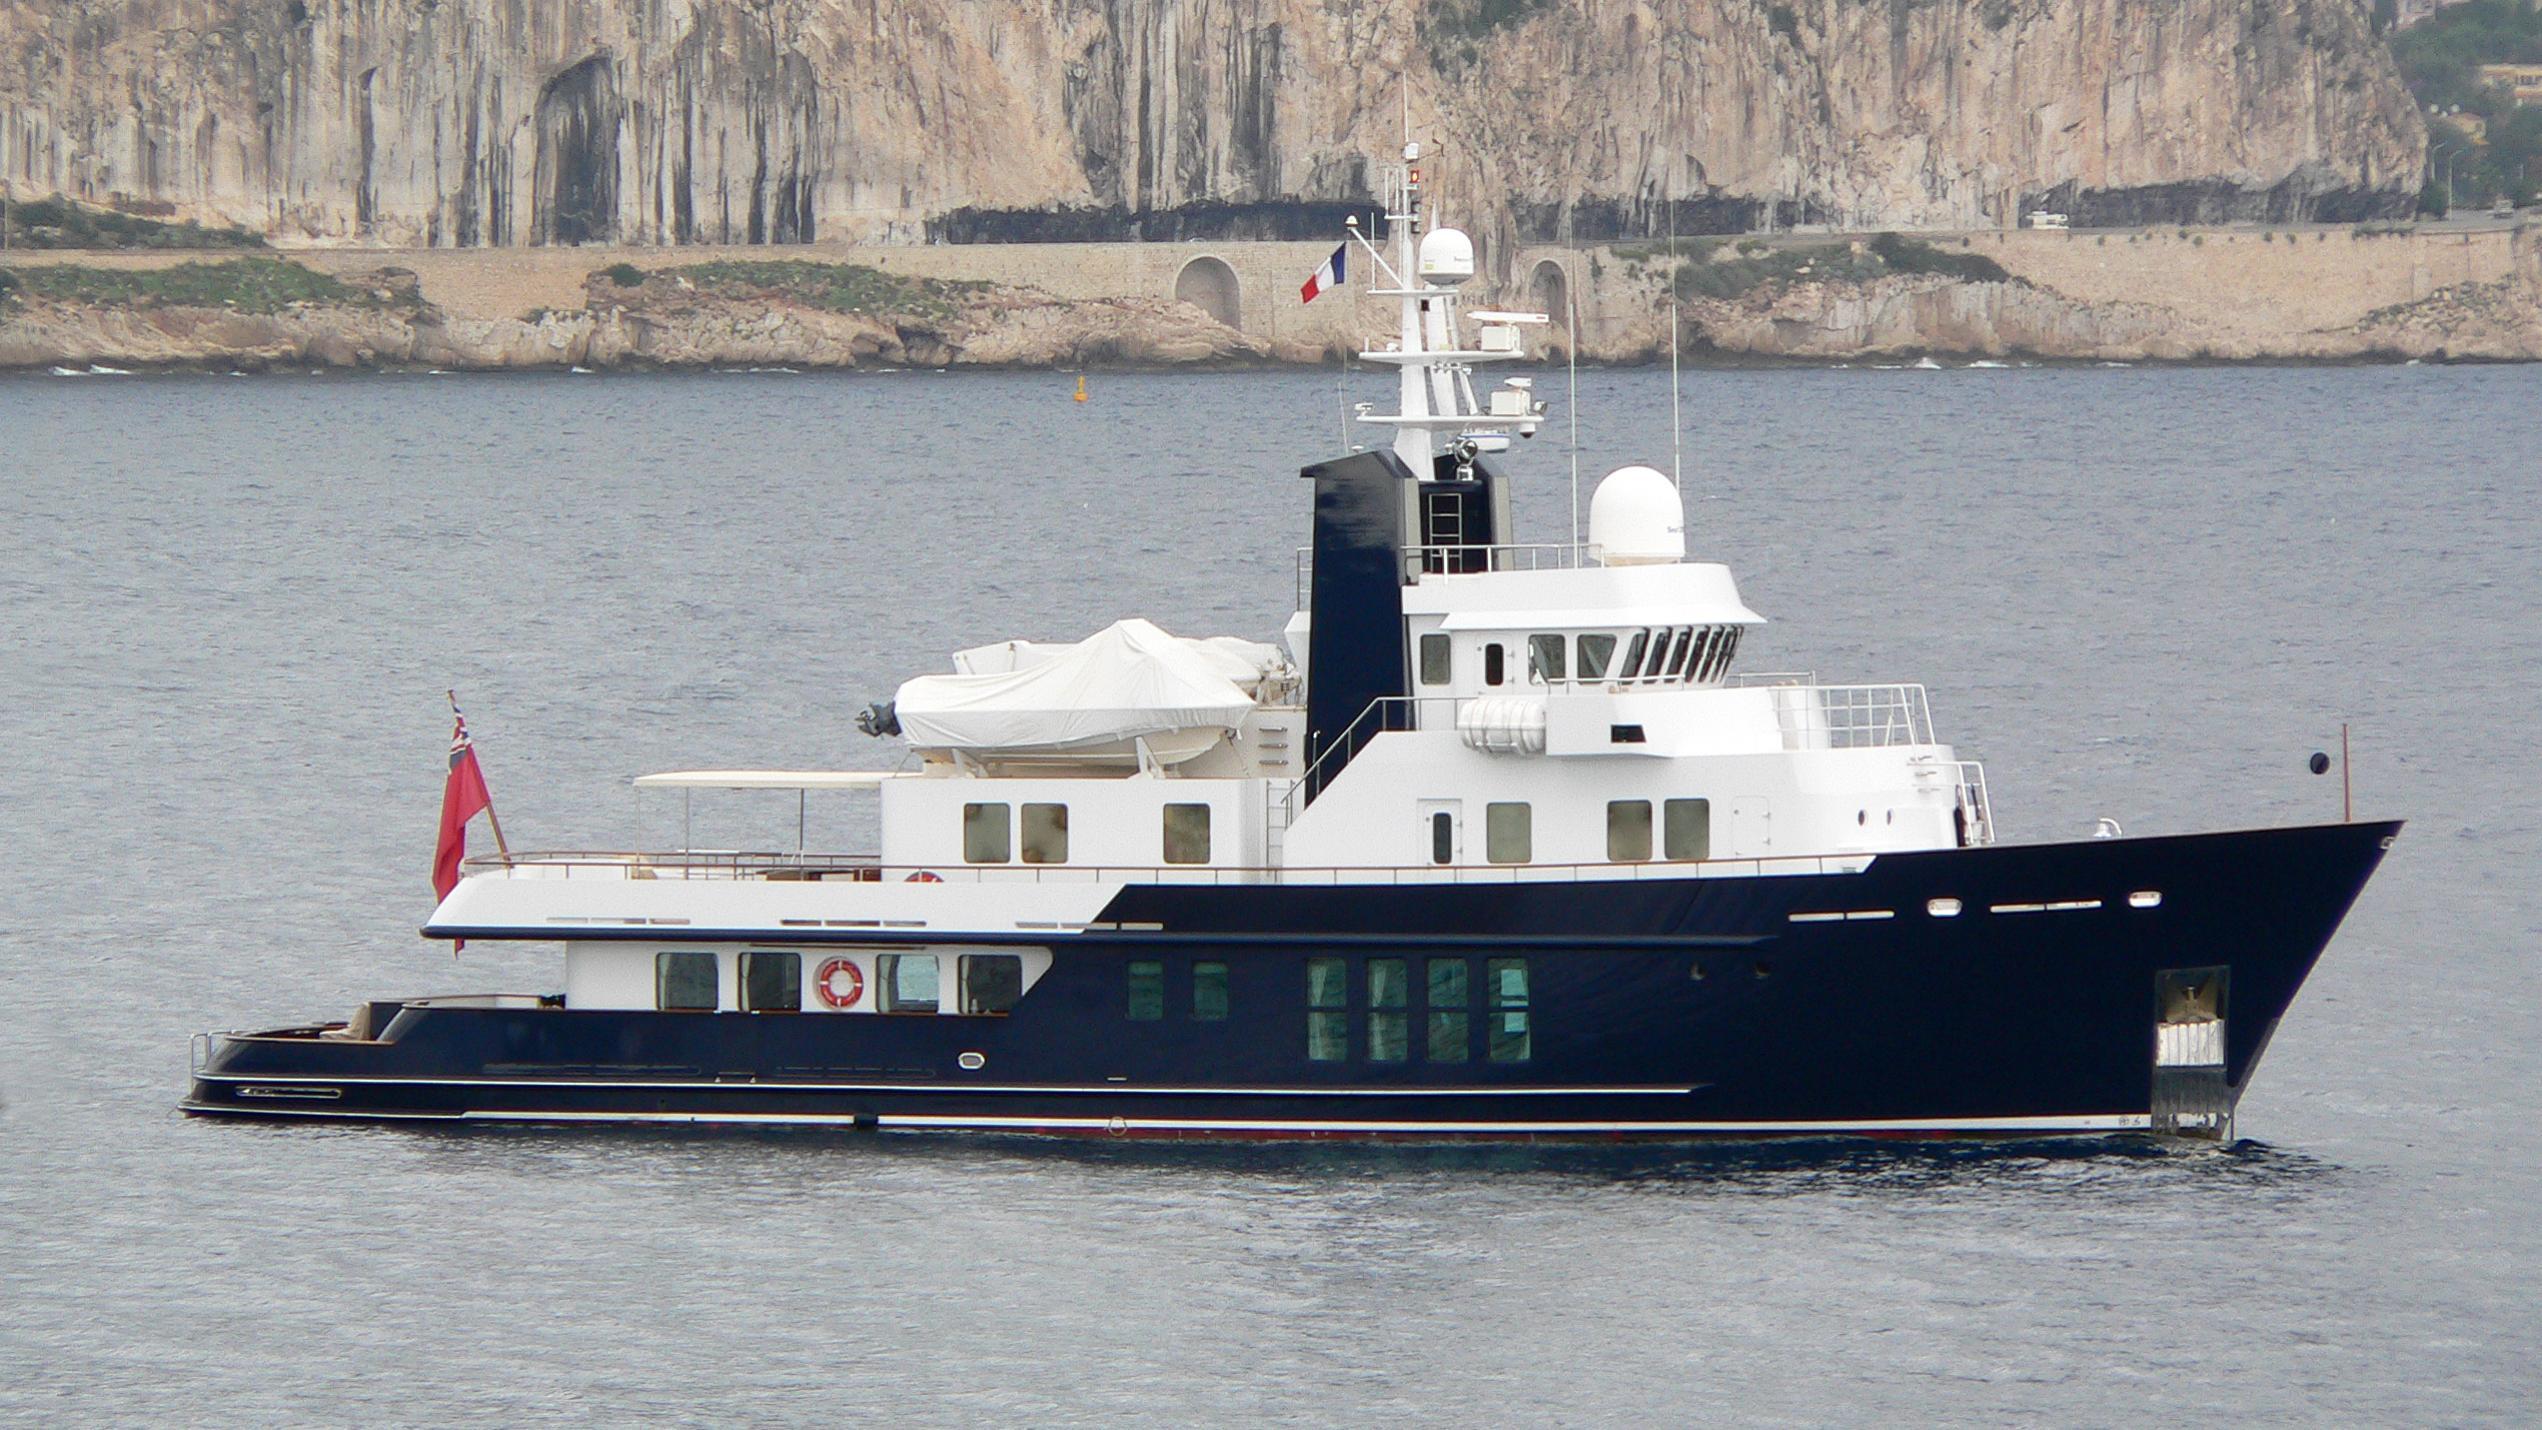 husky-explorer-rh3-motor-yacht-rmk-bradford-120-2003-37m-profile